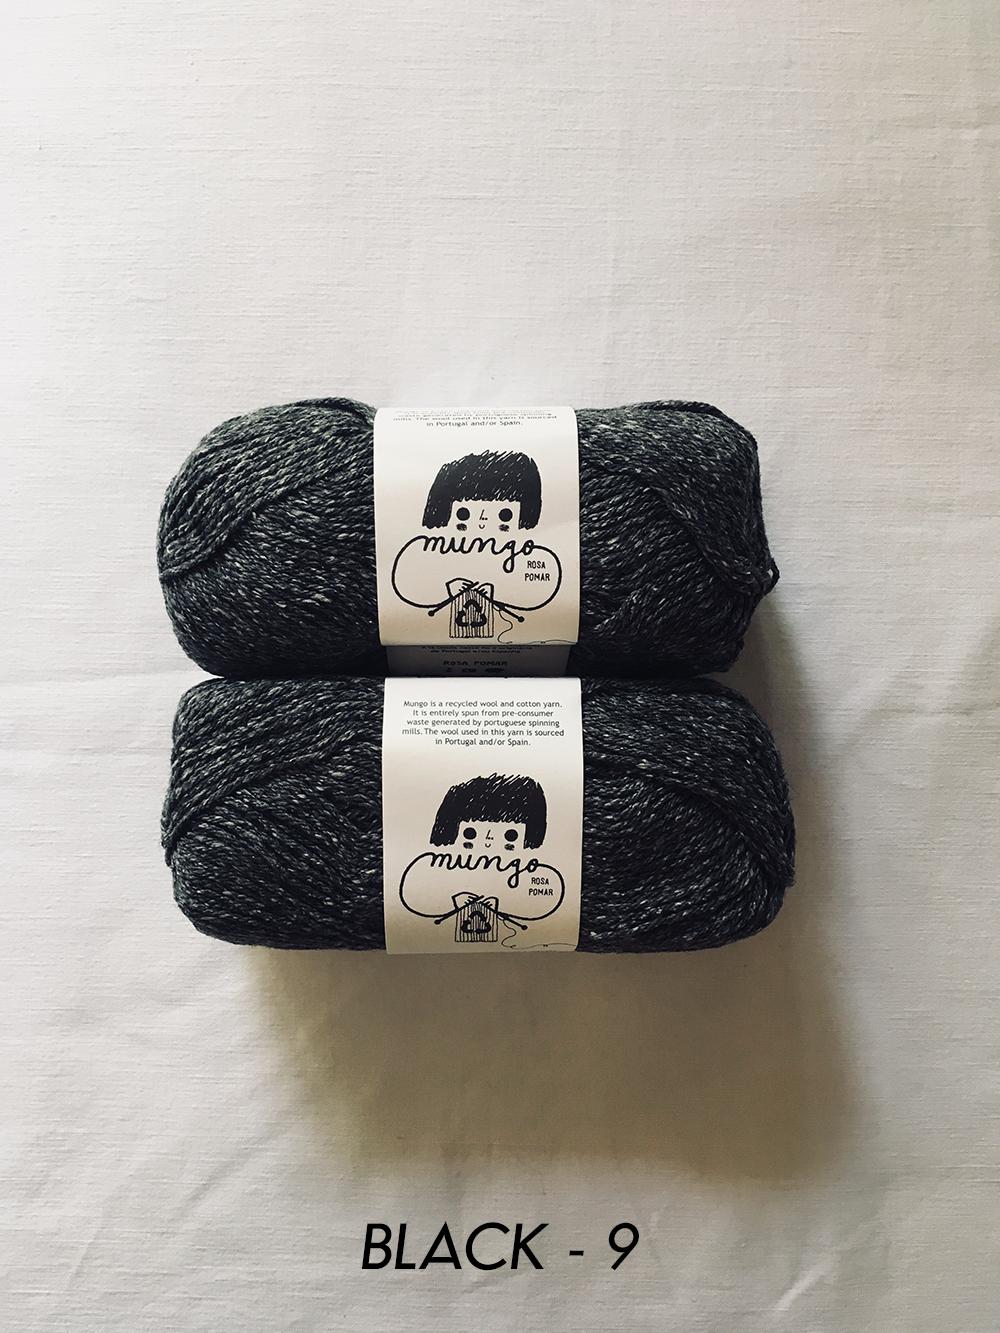 retrosaria_mungo_9_wool_done_knitting.jpg